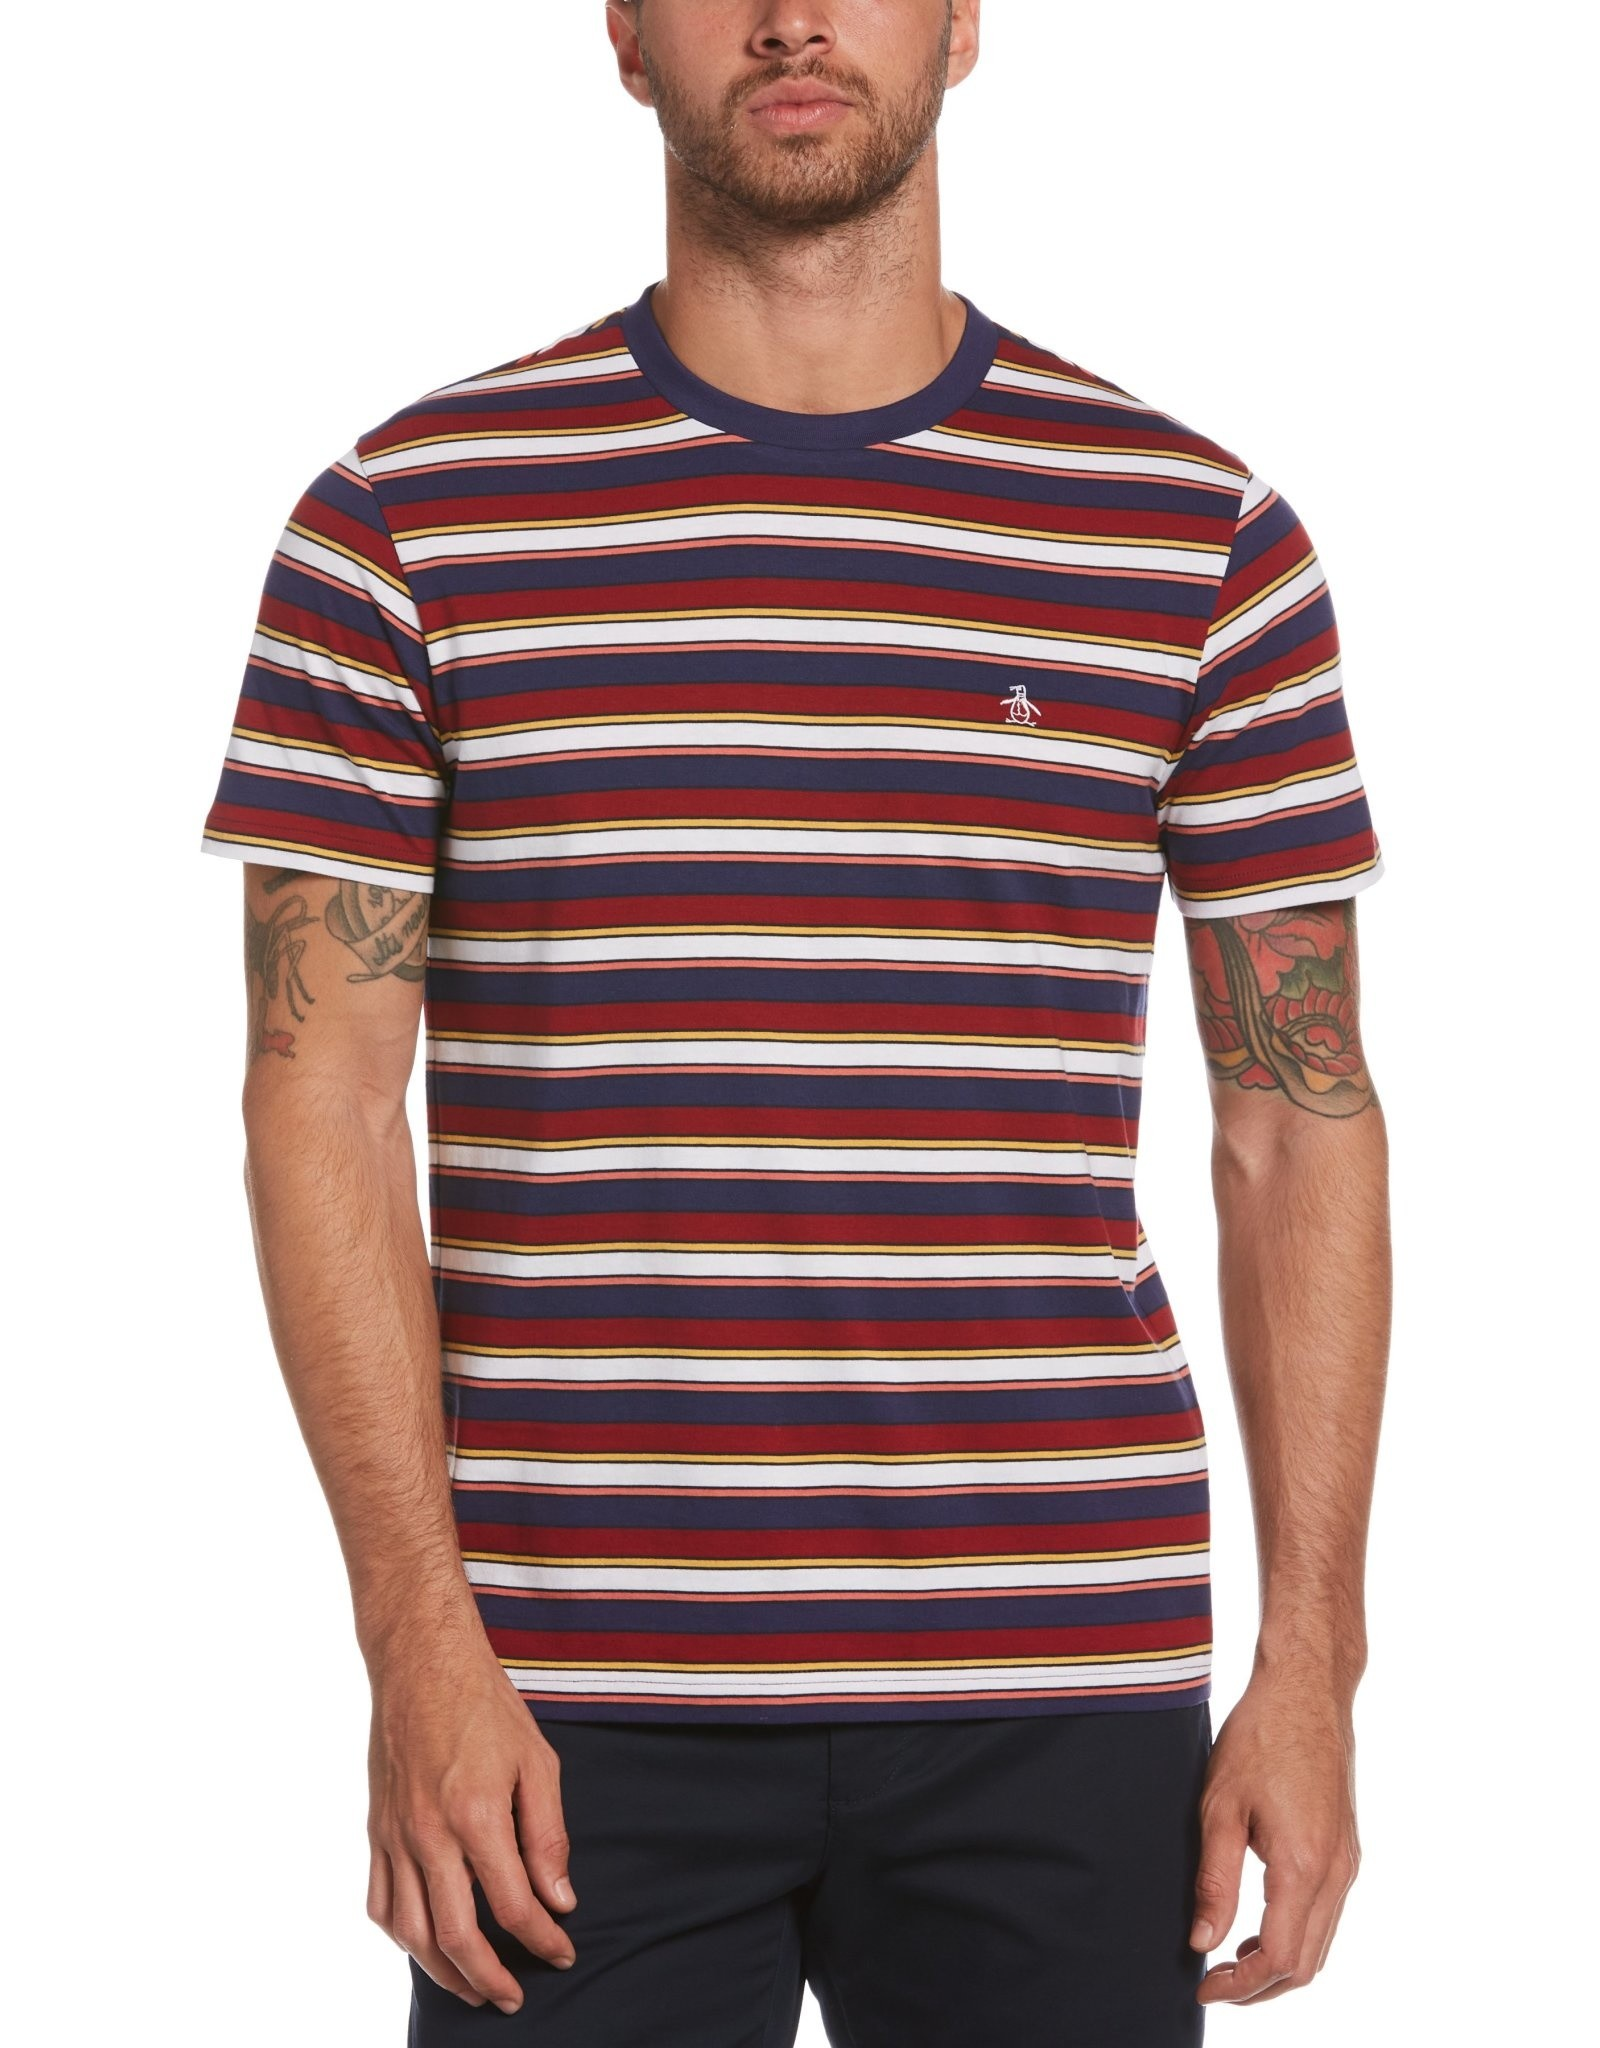 Penguin Multi-Color Stripe T-Shirt